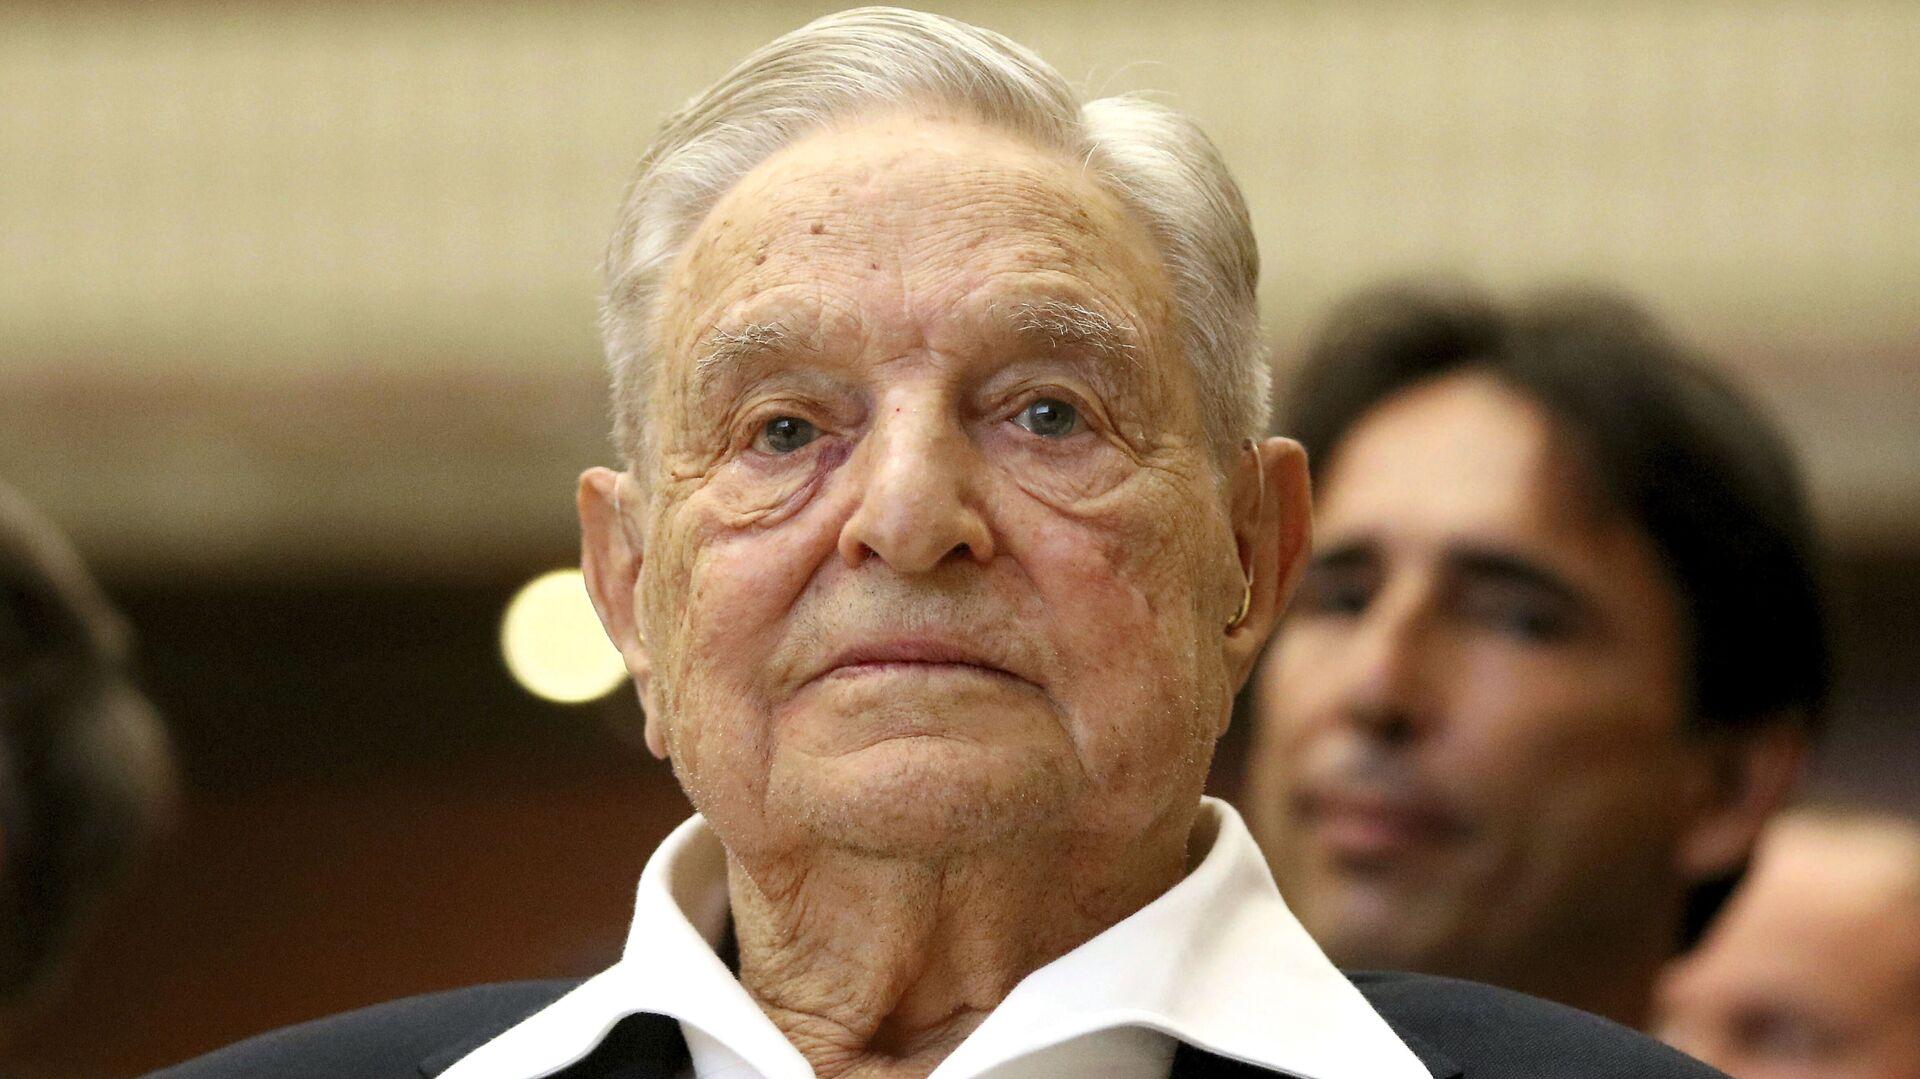 George Soros, inversor húngaro-estadounidense - Sputnik Mundo, 1920, 02.04.2021